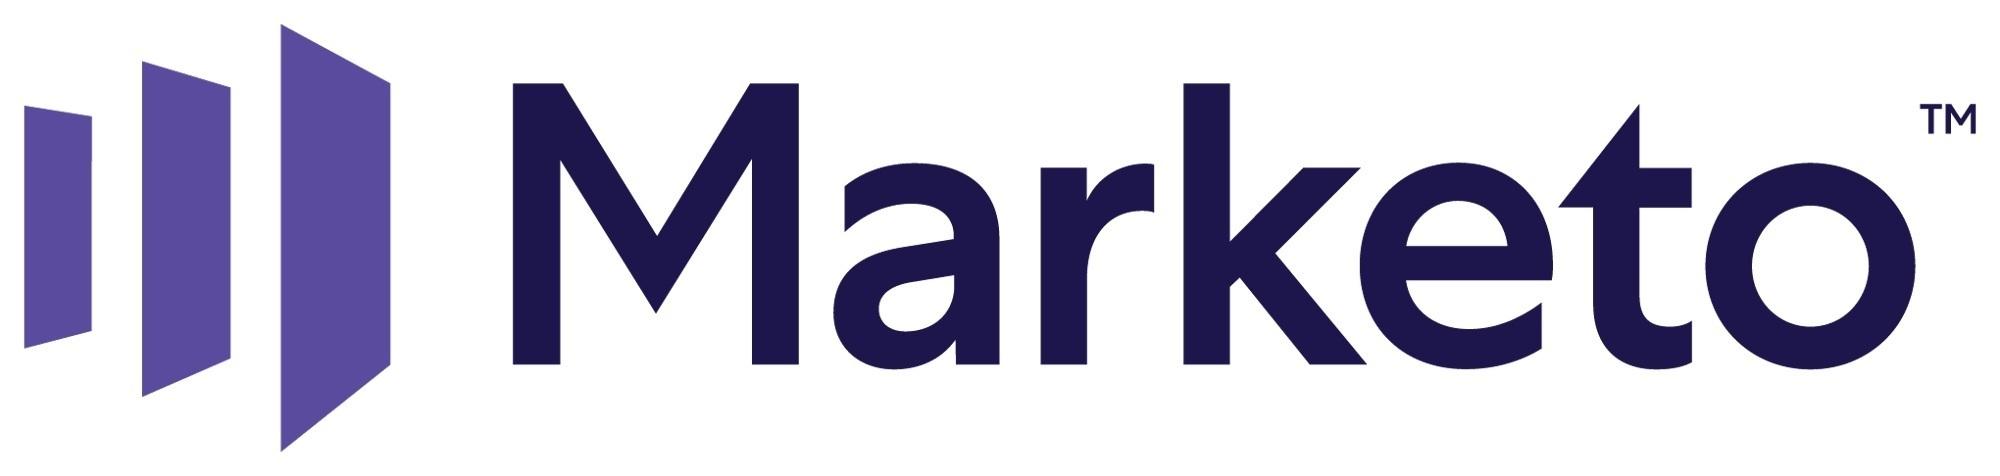 marketo_followup_logo.jpg